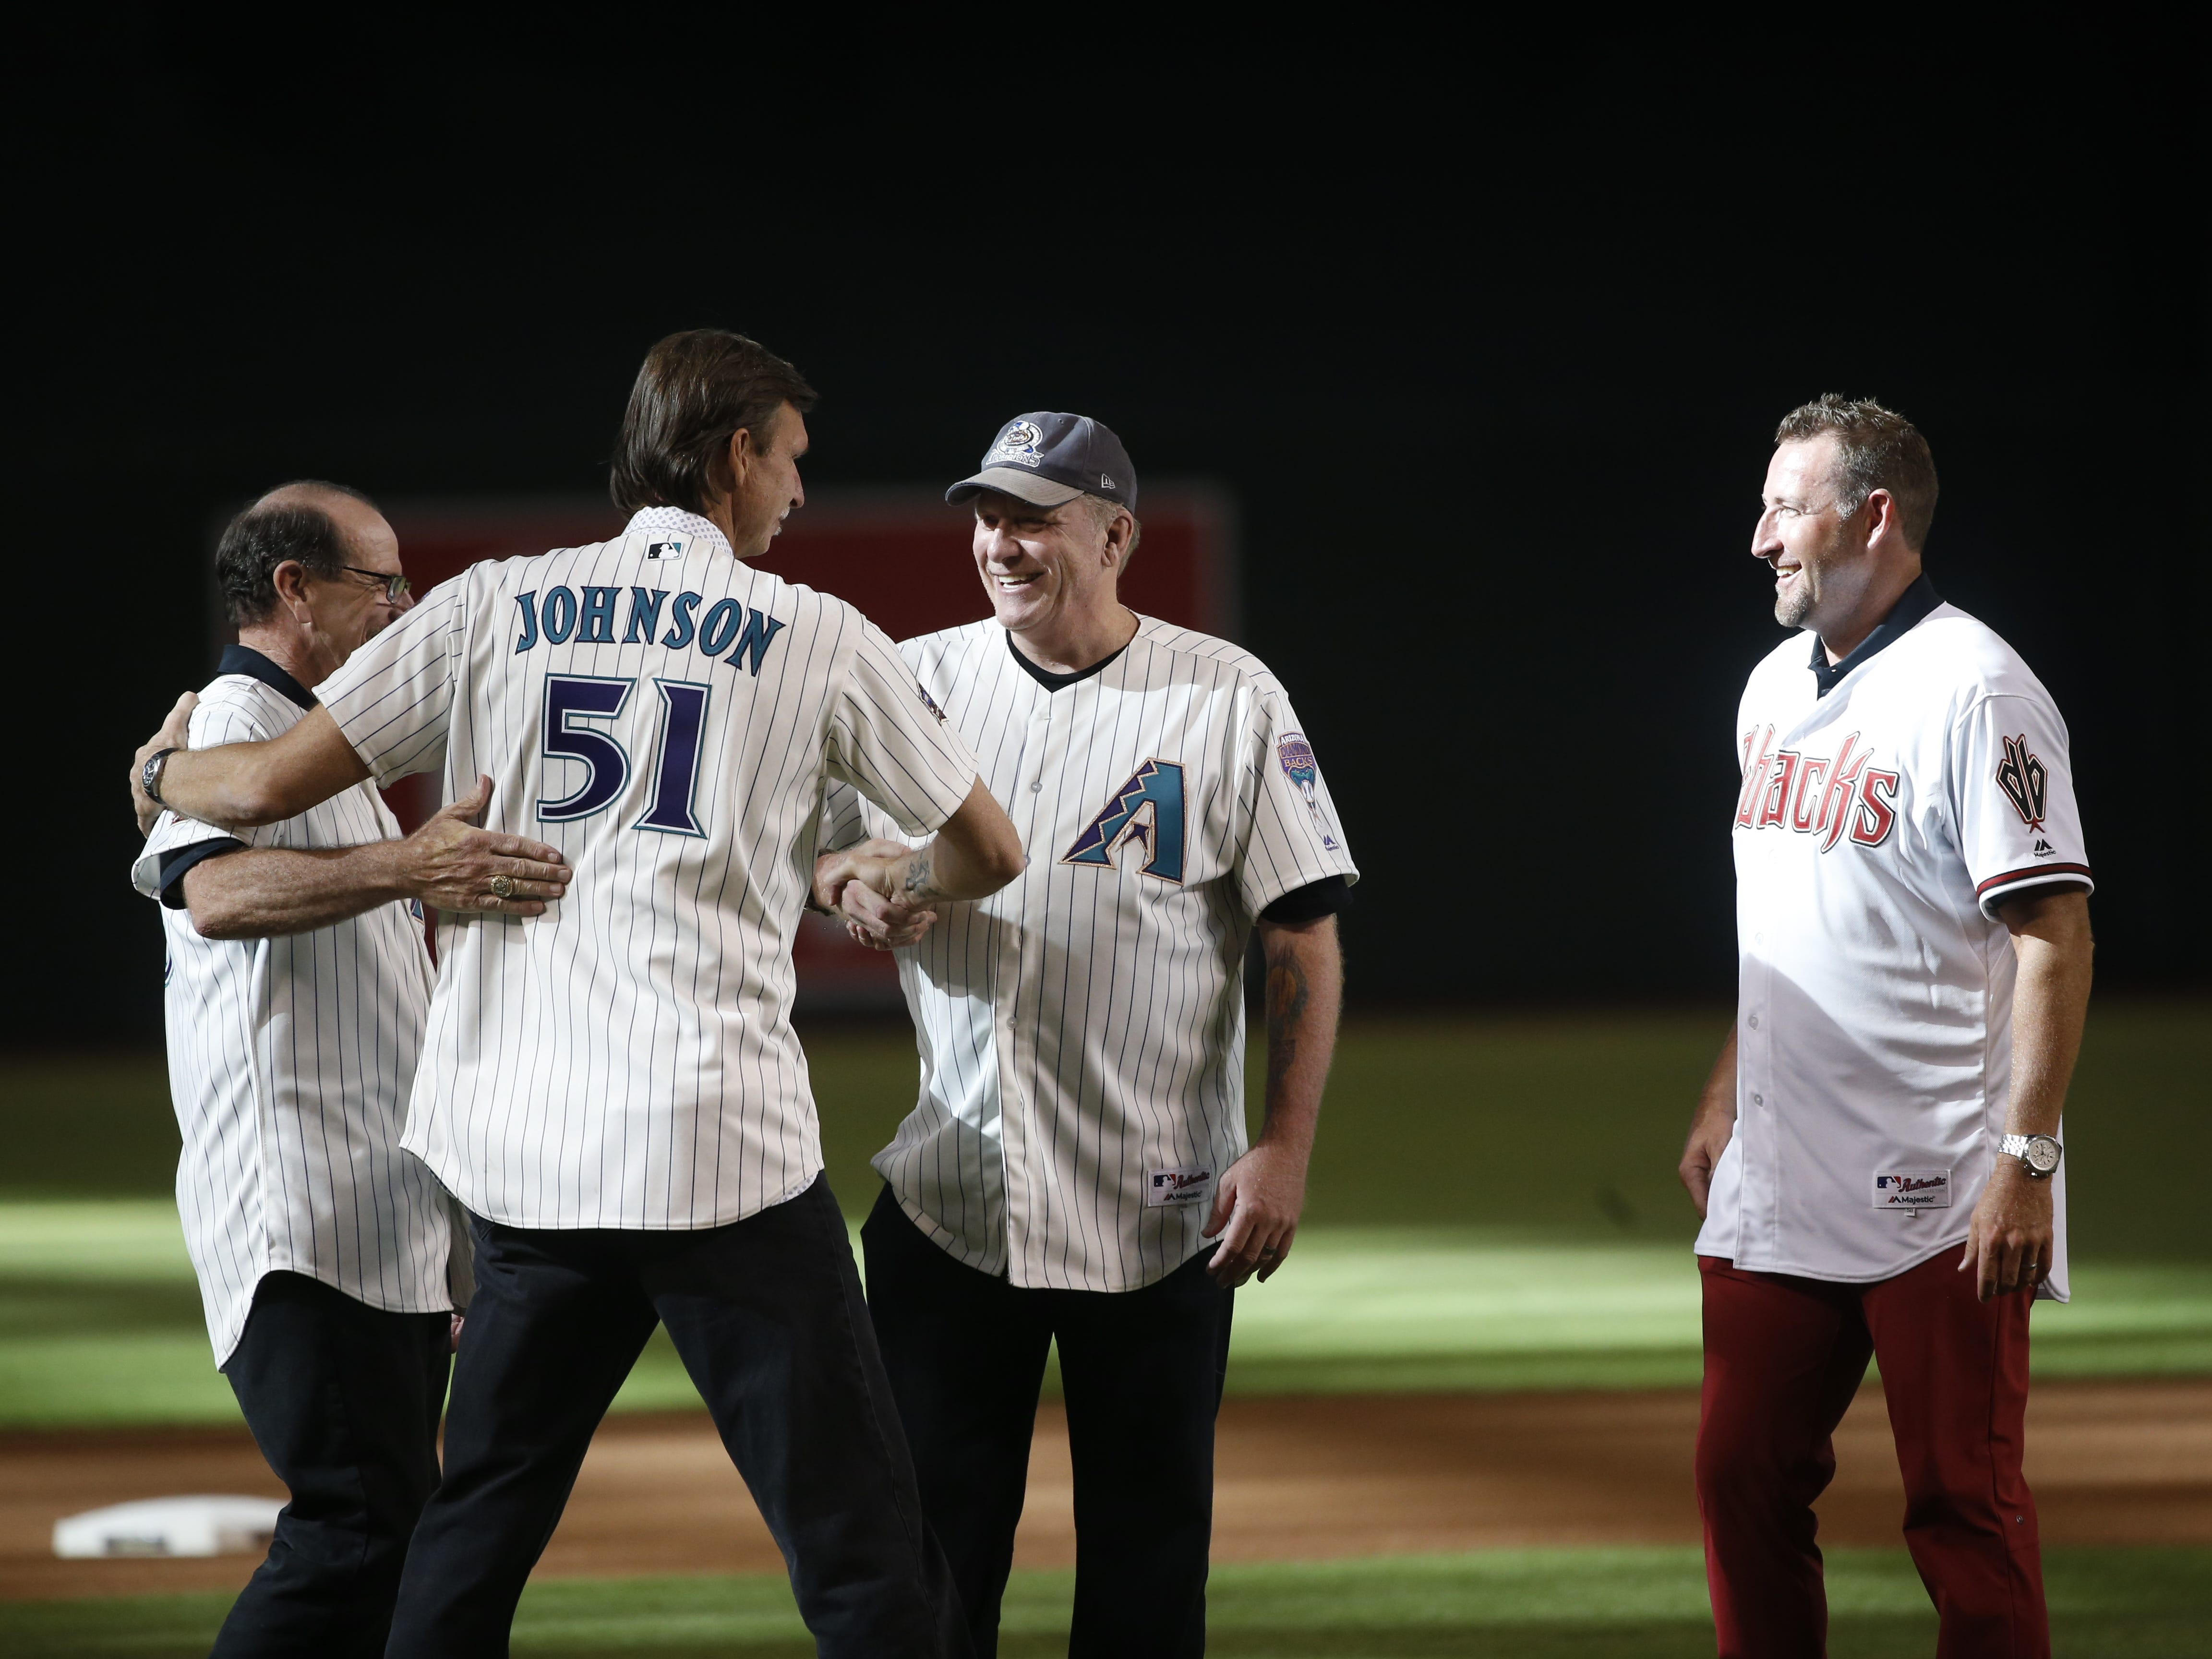 Diamondbacks Randy Johnson (51) hugs former manager Bob Brenly before greeting pitchers Curt Schilling (center) and Brandon Webb (R) as the group was chosen for the Diamondbacks 20th Anniversary team prior to a Diamondbacks game at Chase Field in Phoenix, Ariz. on Aug. 4, 2018.